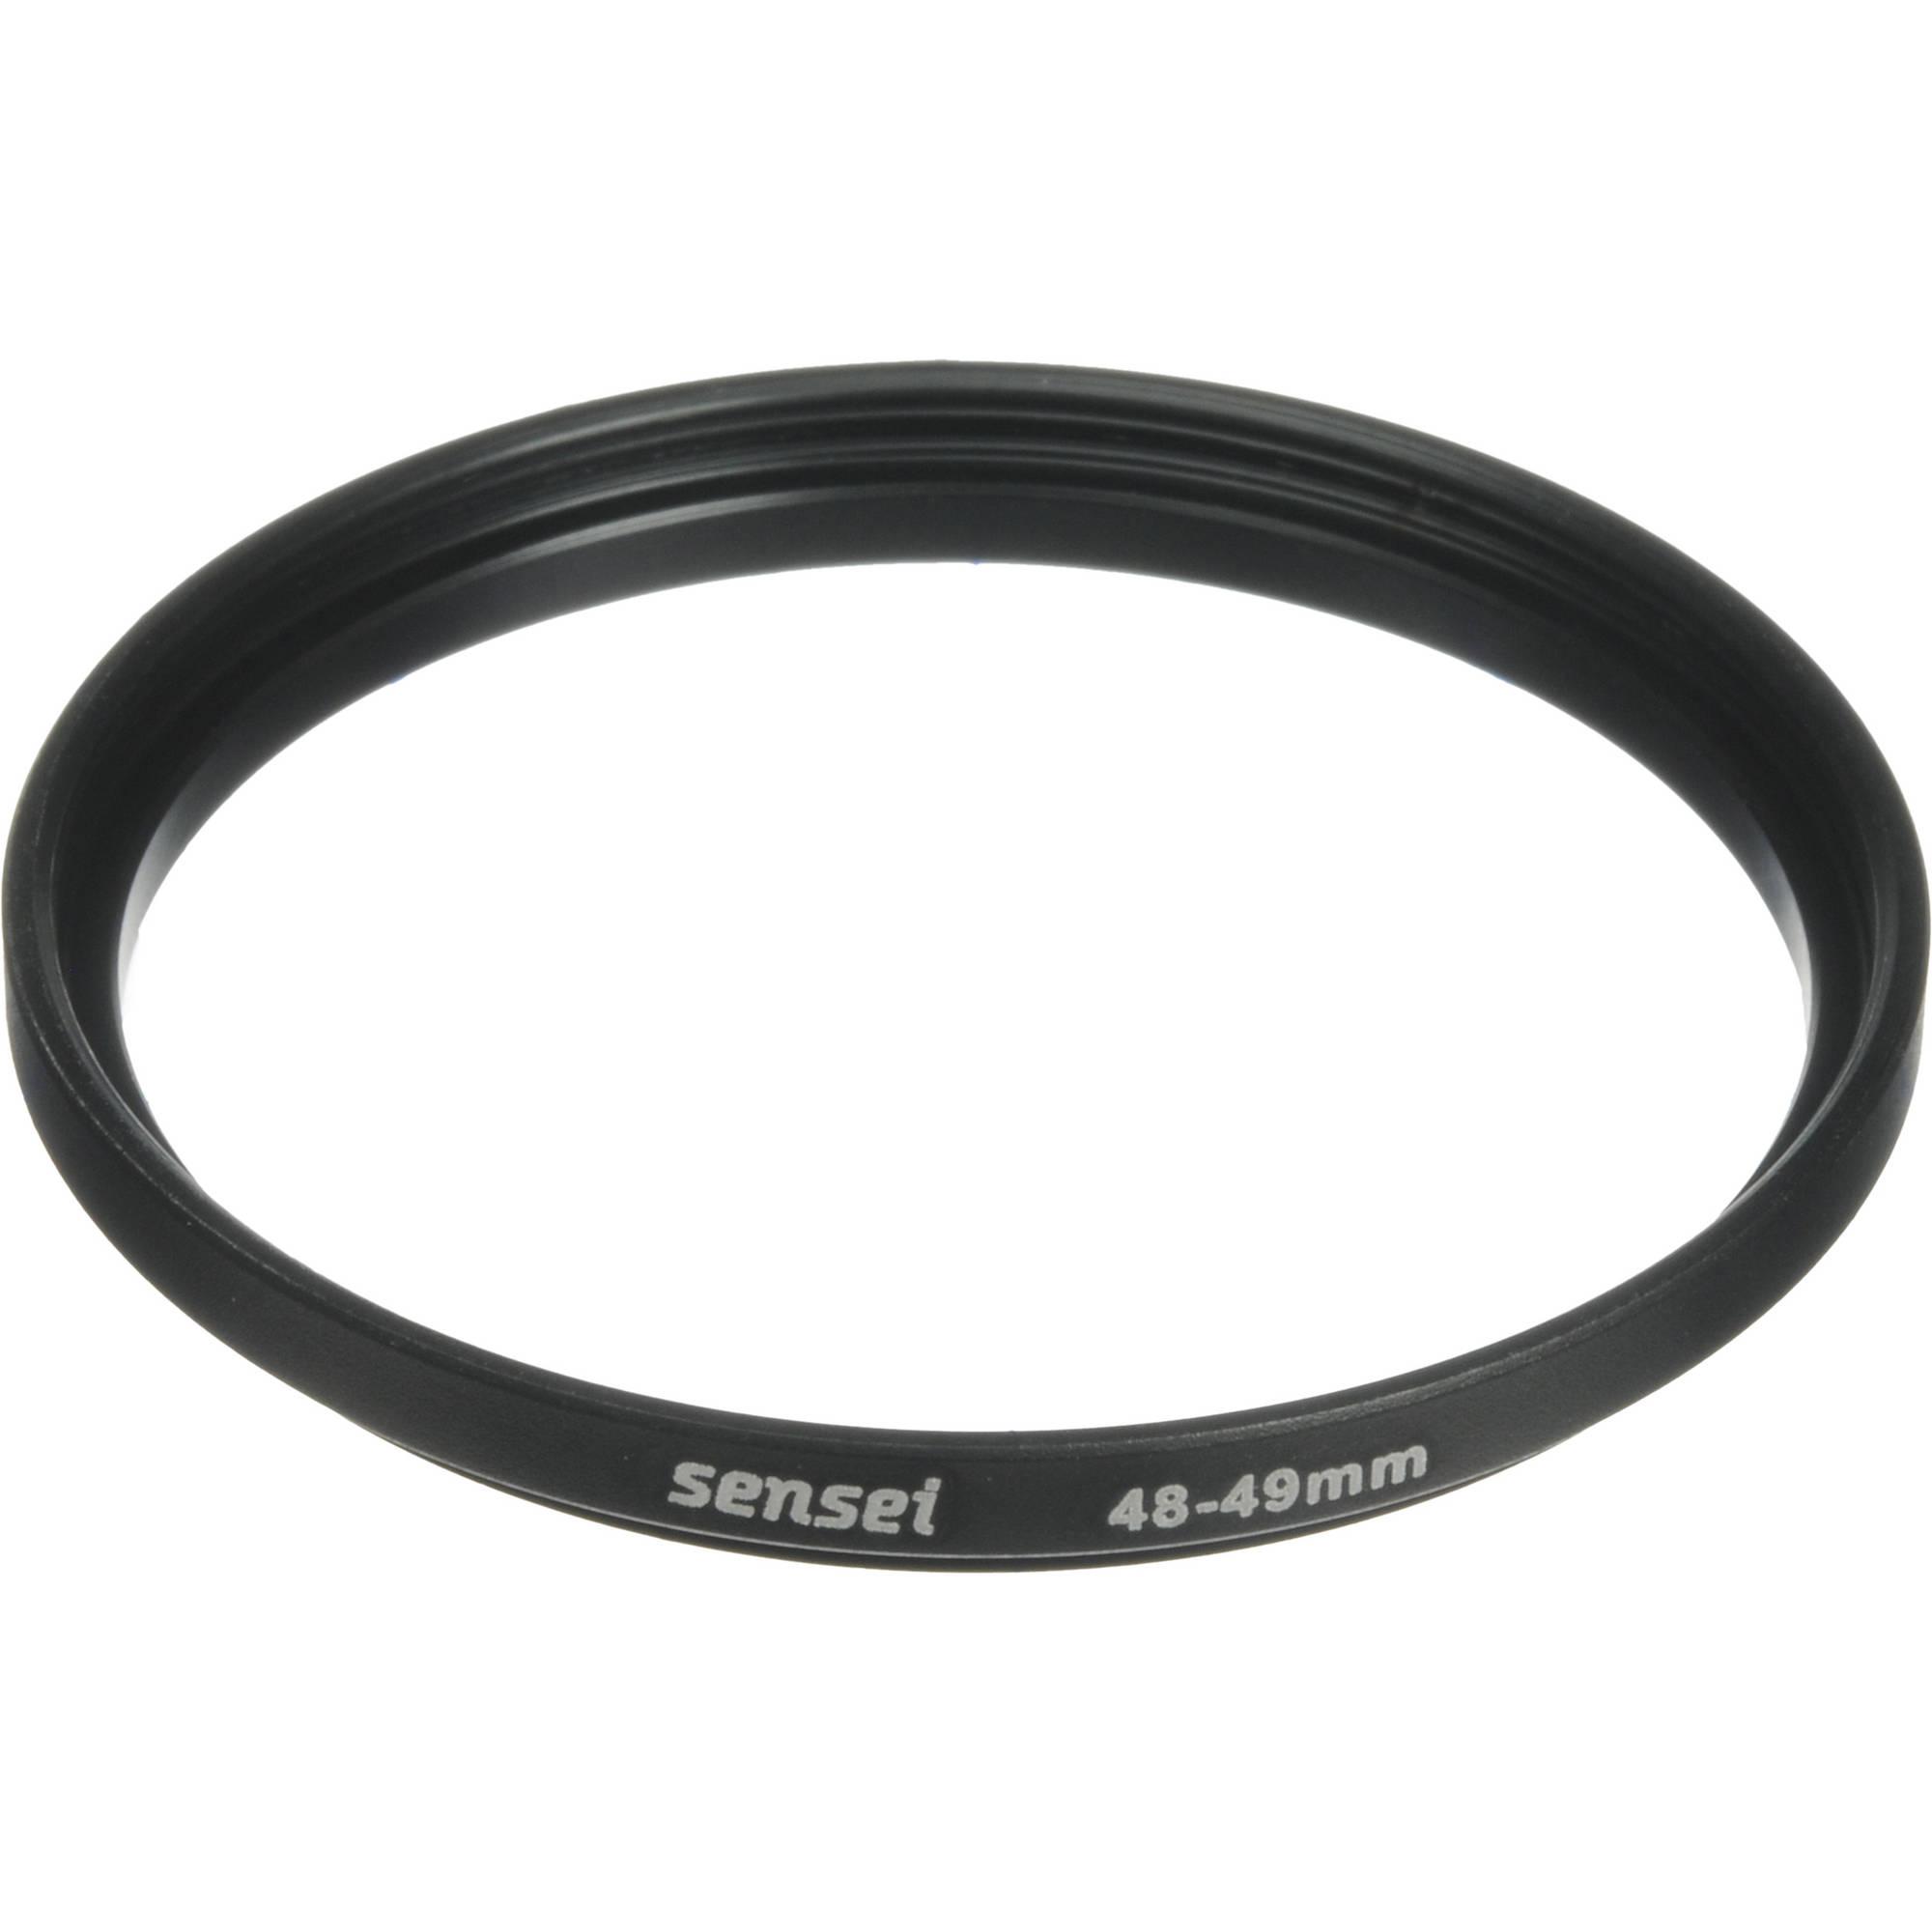 Sensei 39-49mm Step-Up Ring